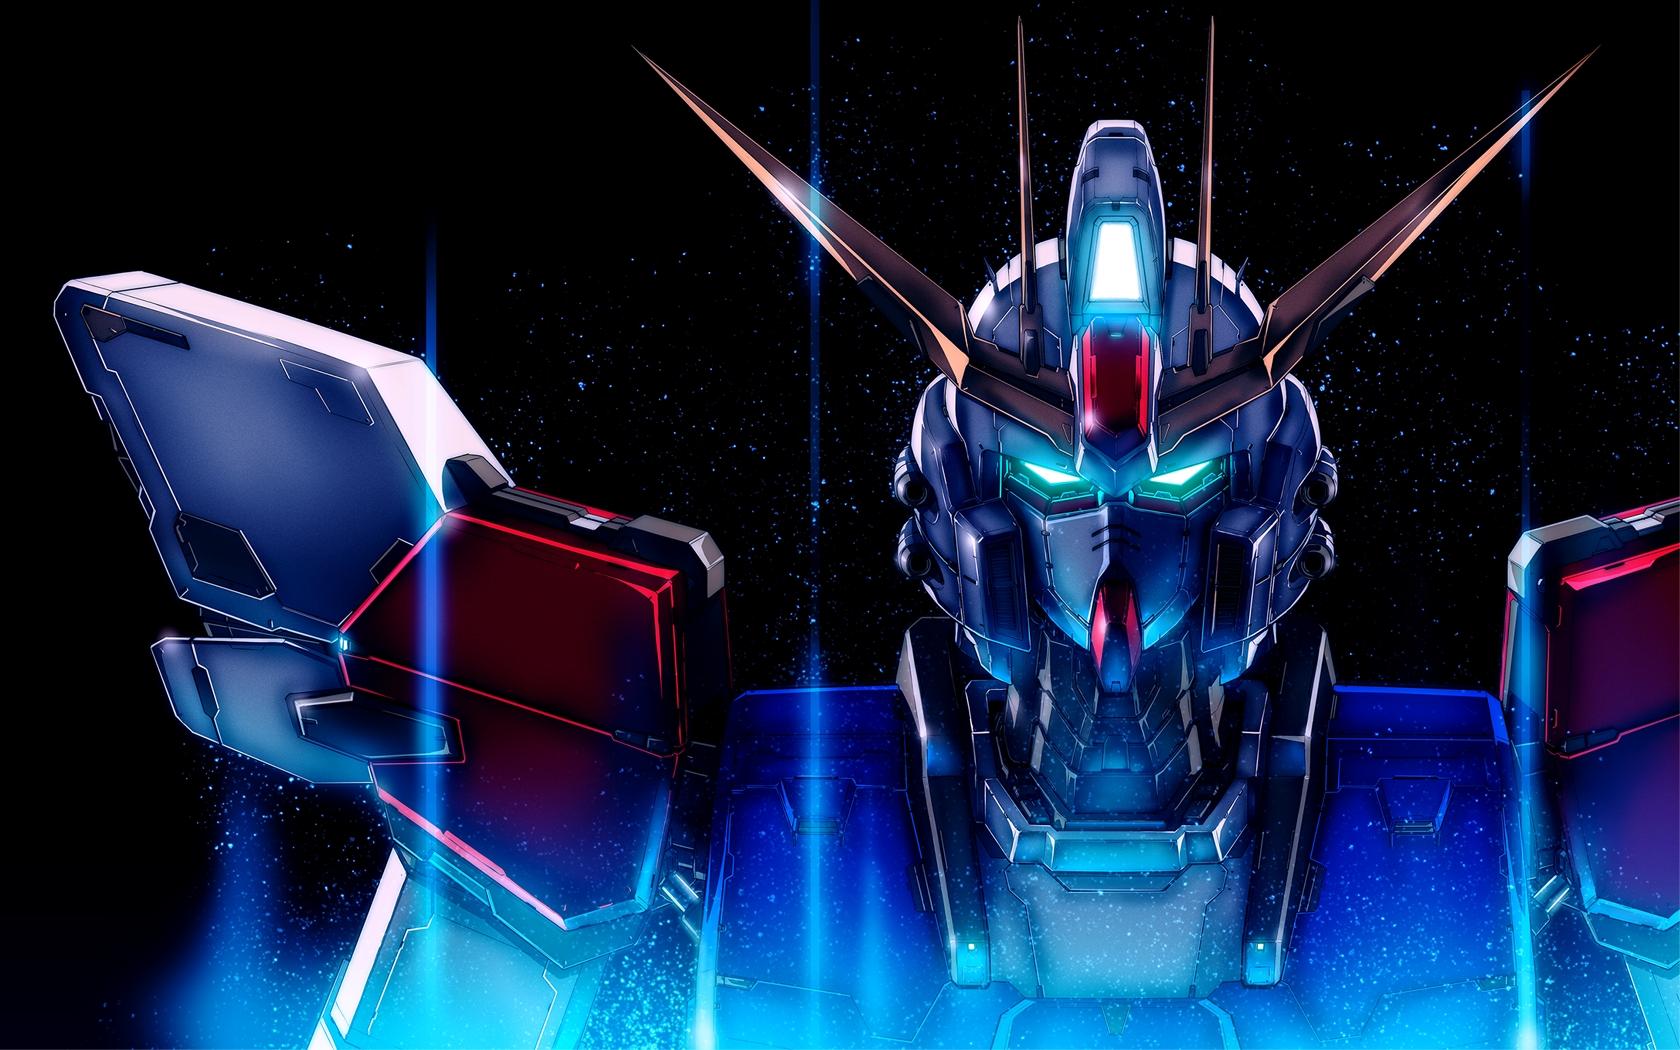 Build Strike Gundam Art Wallpaper #4375 Wallpaper Themes